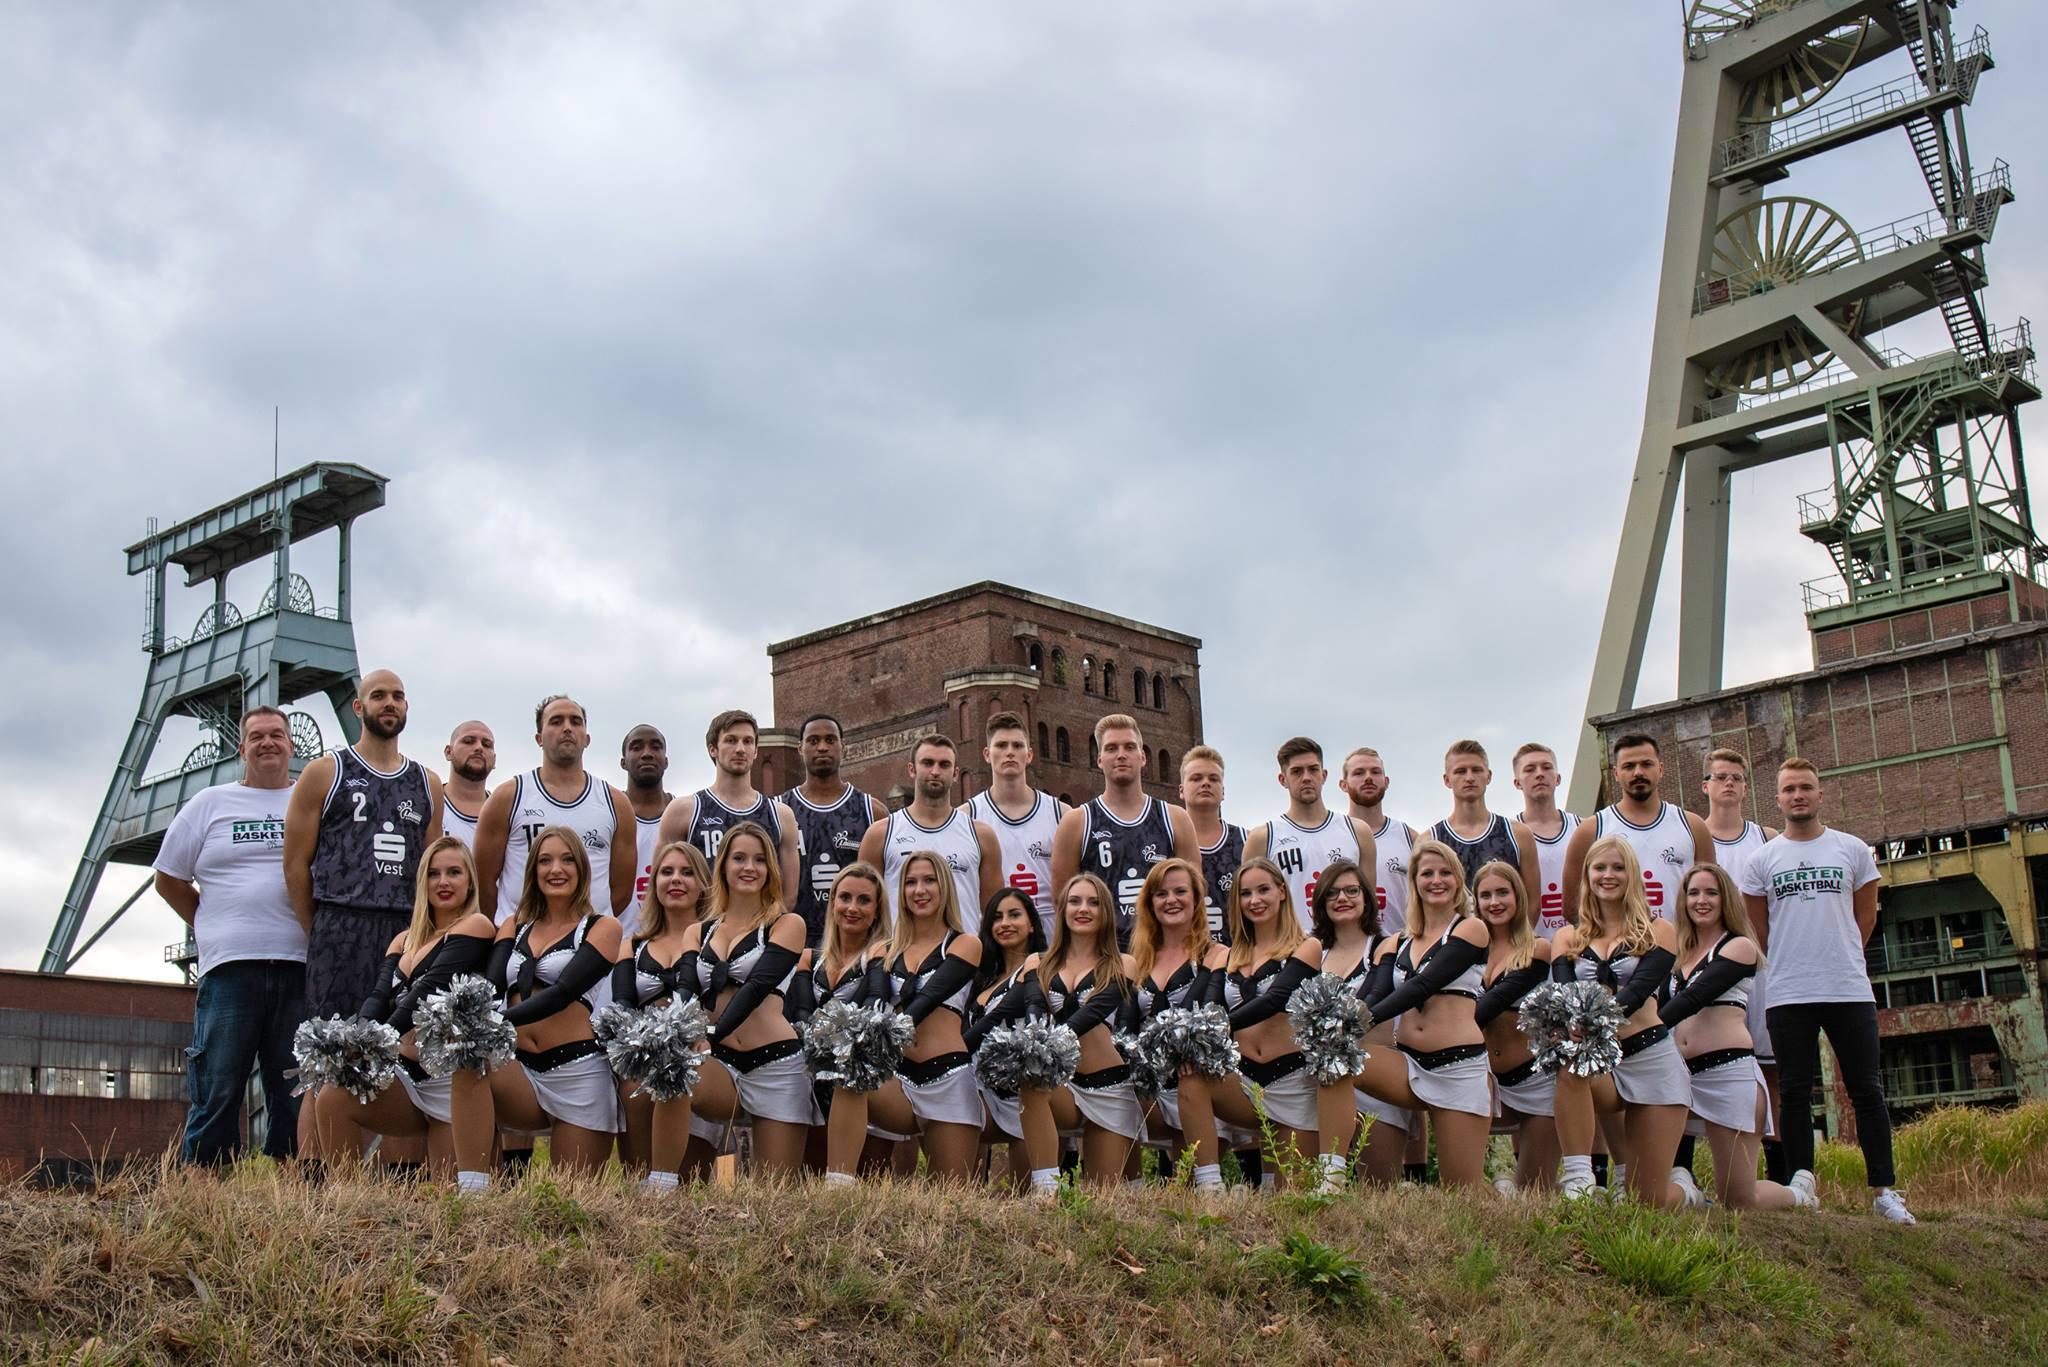 Magic Paws Cheerleader American Football Team aus Herten ...